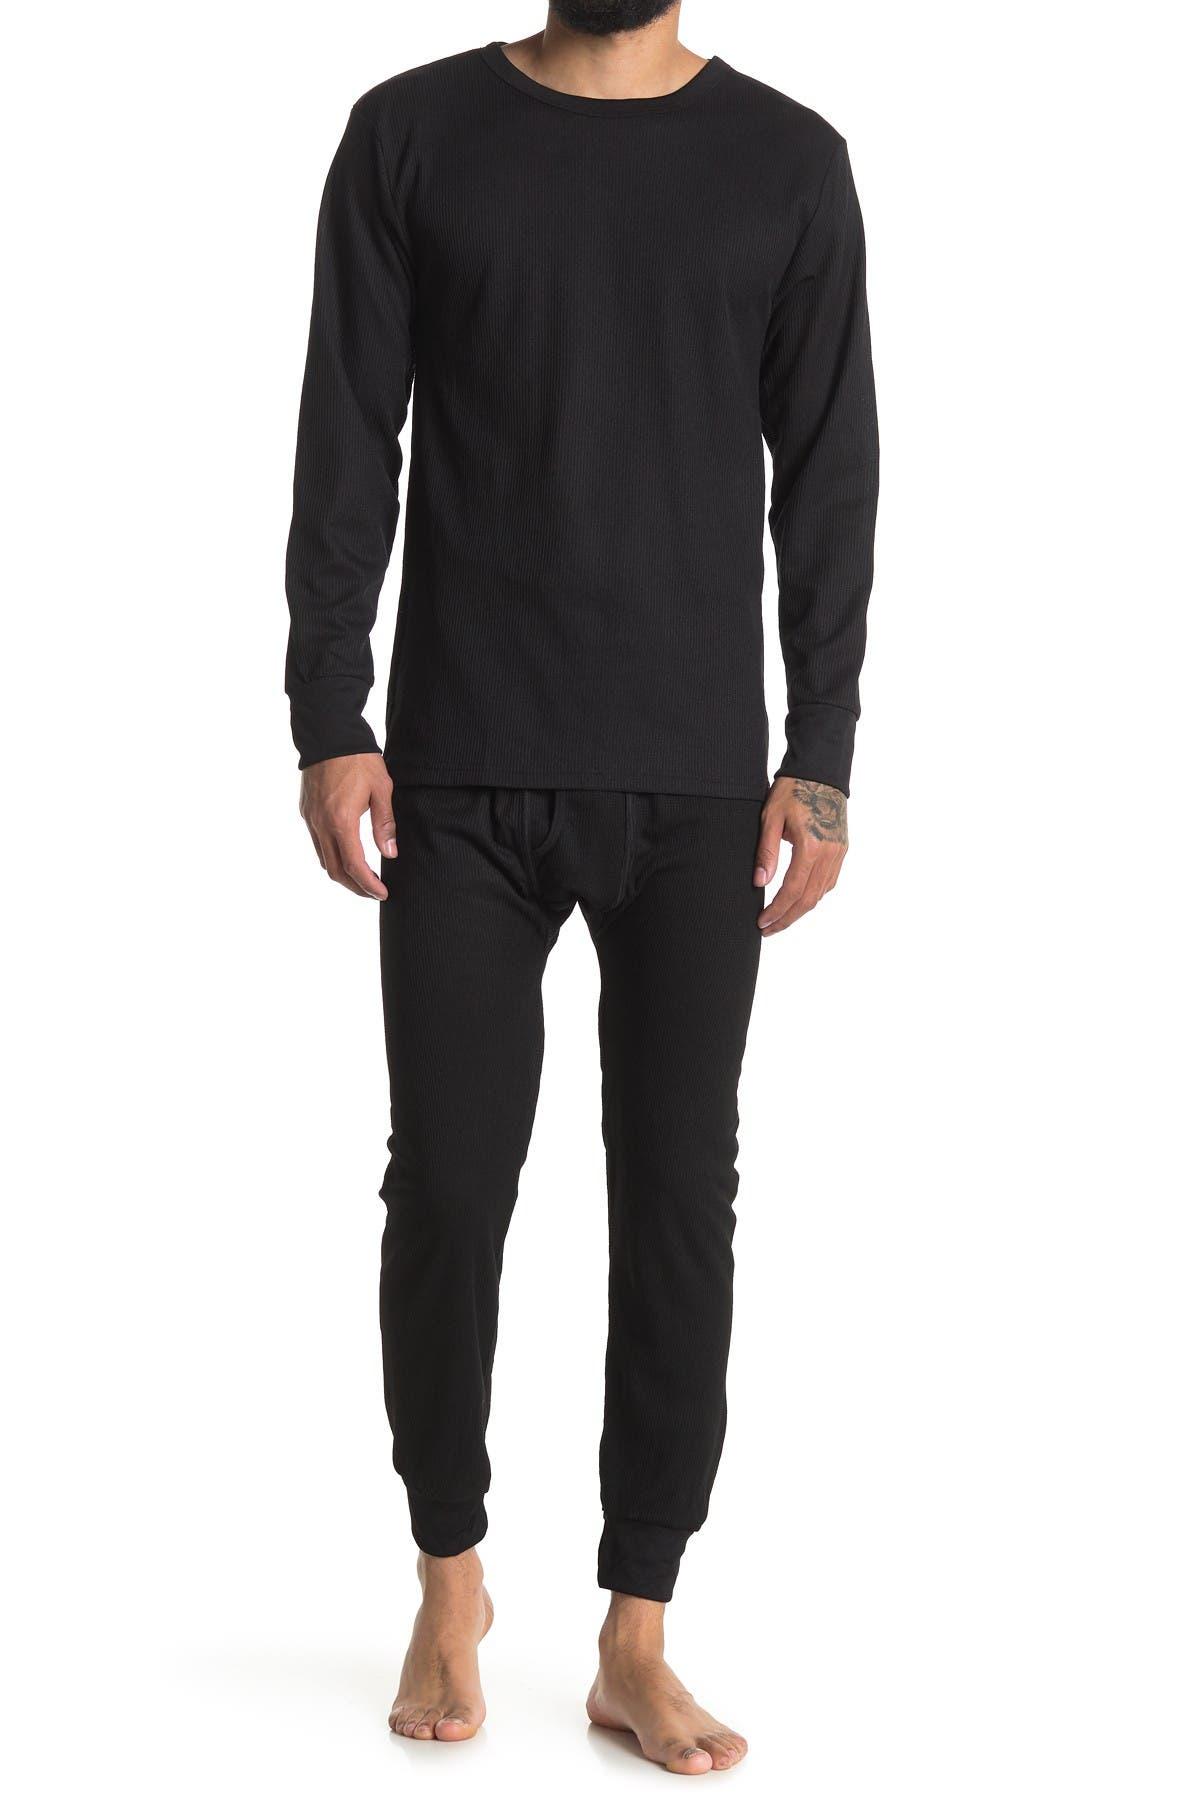 Image of Northern Exposure Thermal Shirt & Pants 2-Piece Pajama Set